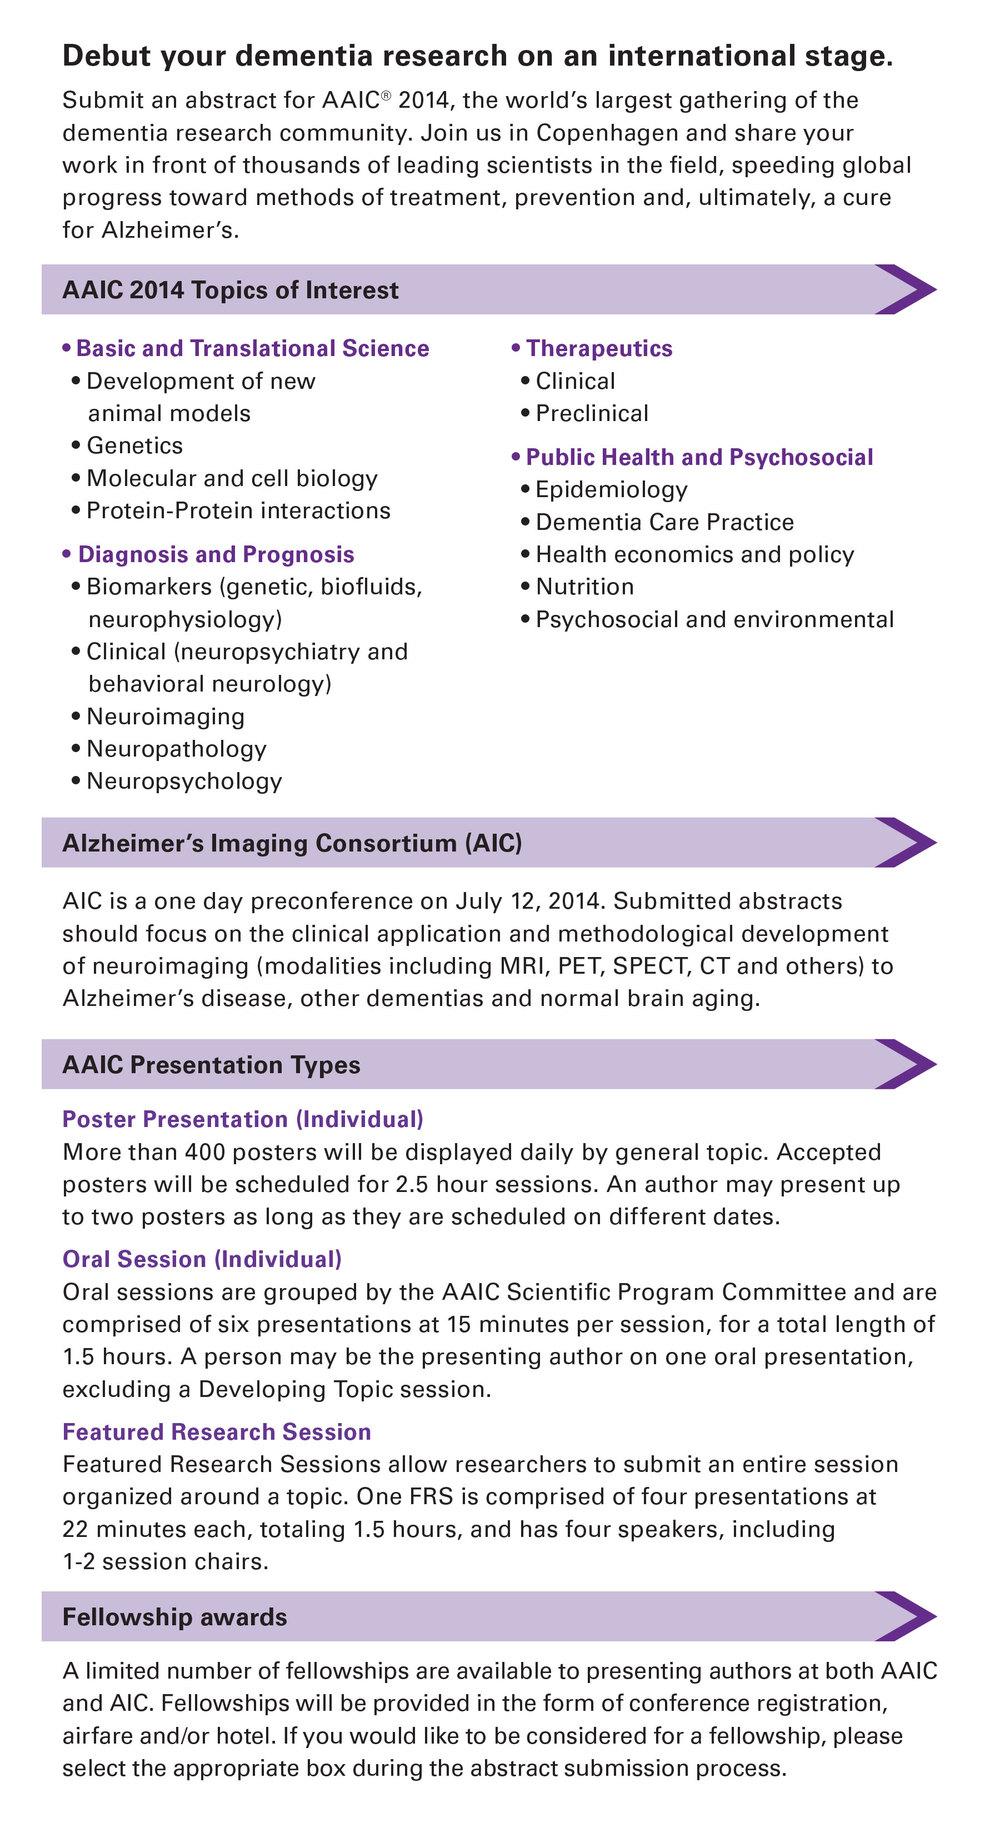 AAIC14 ABSTRACT POSTCARD